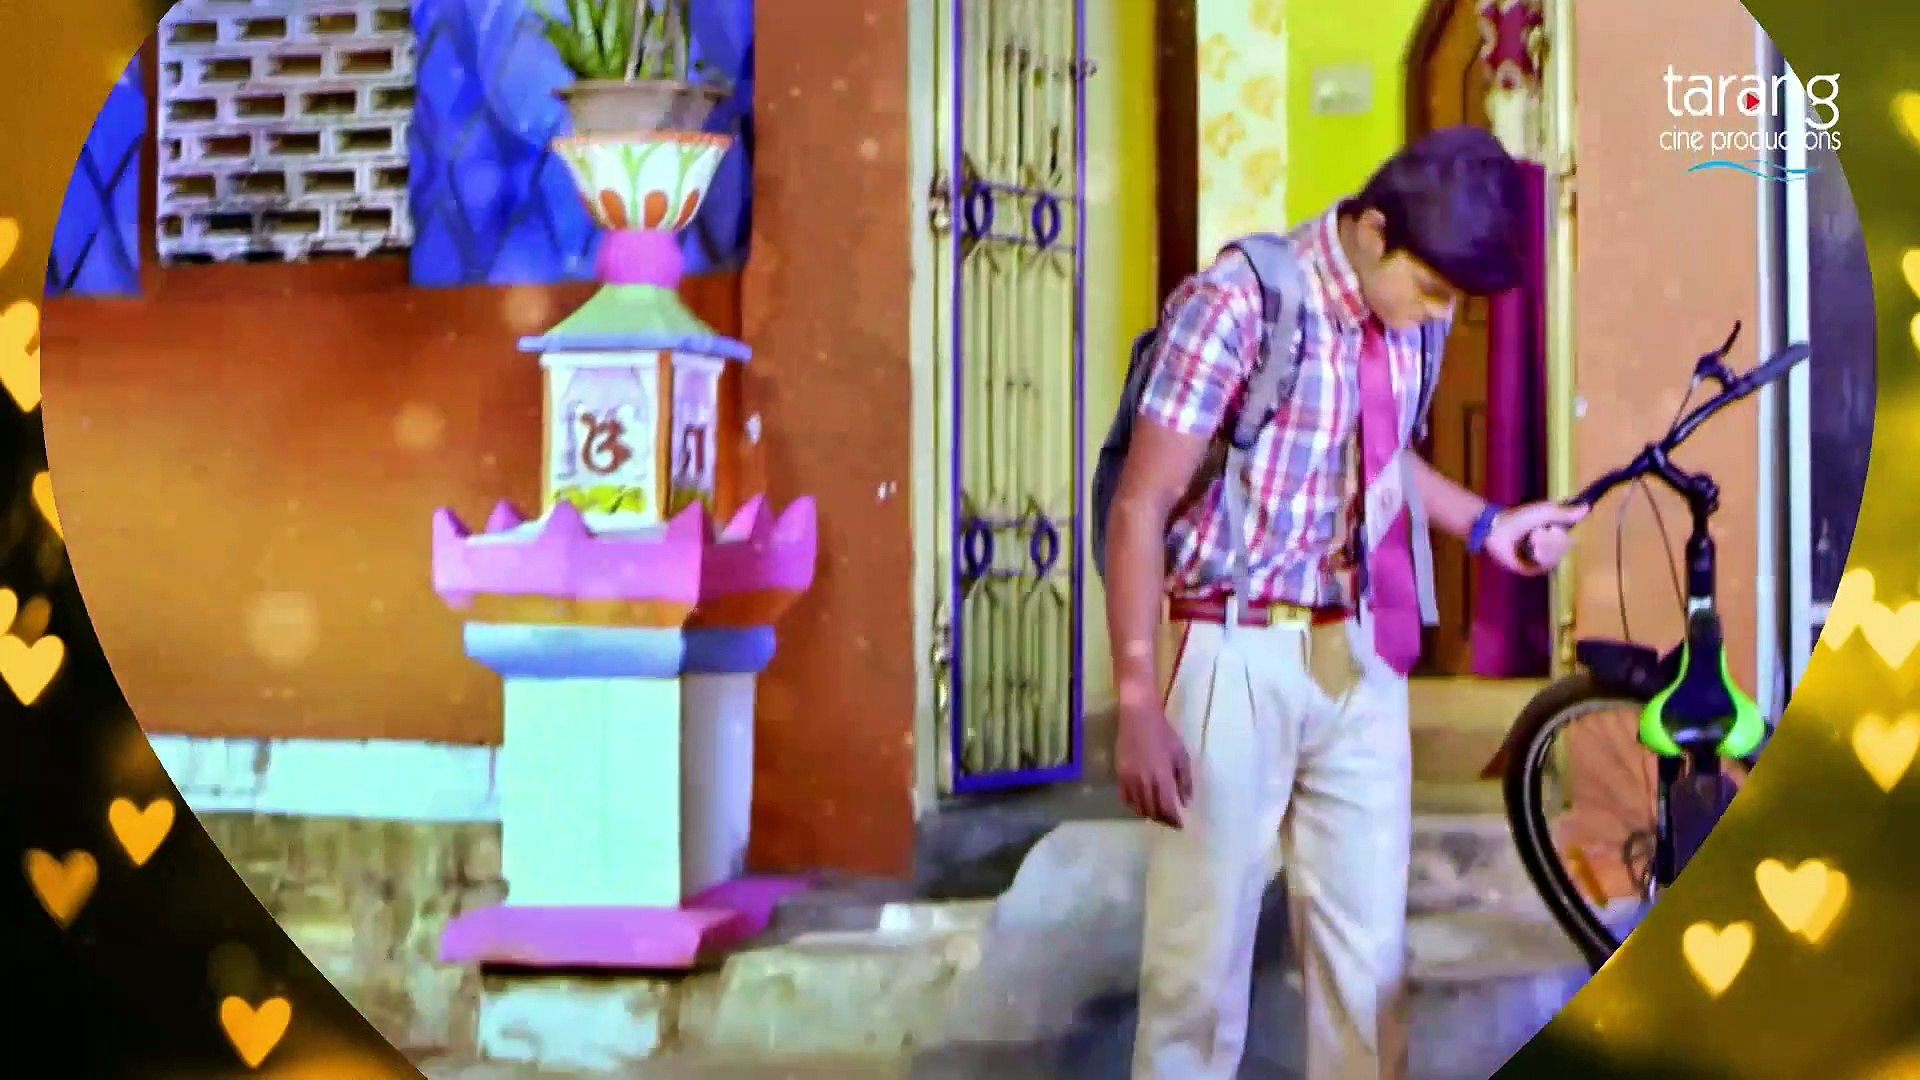 Ye Loveship full Video -  Chal Tike Dusta Heba -  Rishan, Sayal -Chal Tike Dusta Heba Film - New Odi